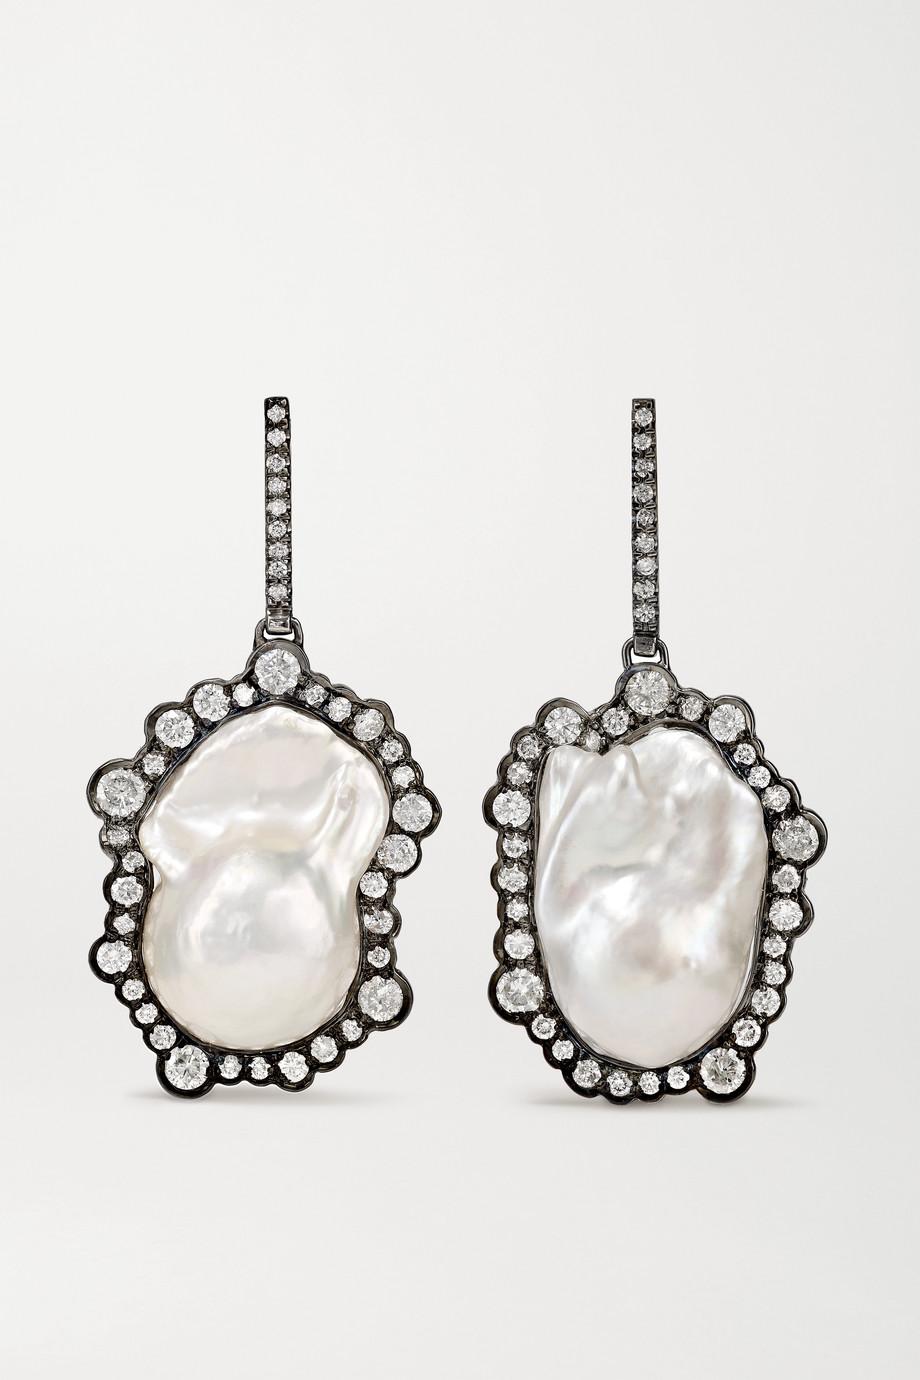 Kimberly McDonald 18-karat blackened white gold, diamond and pearl earrings